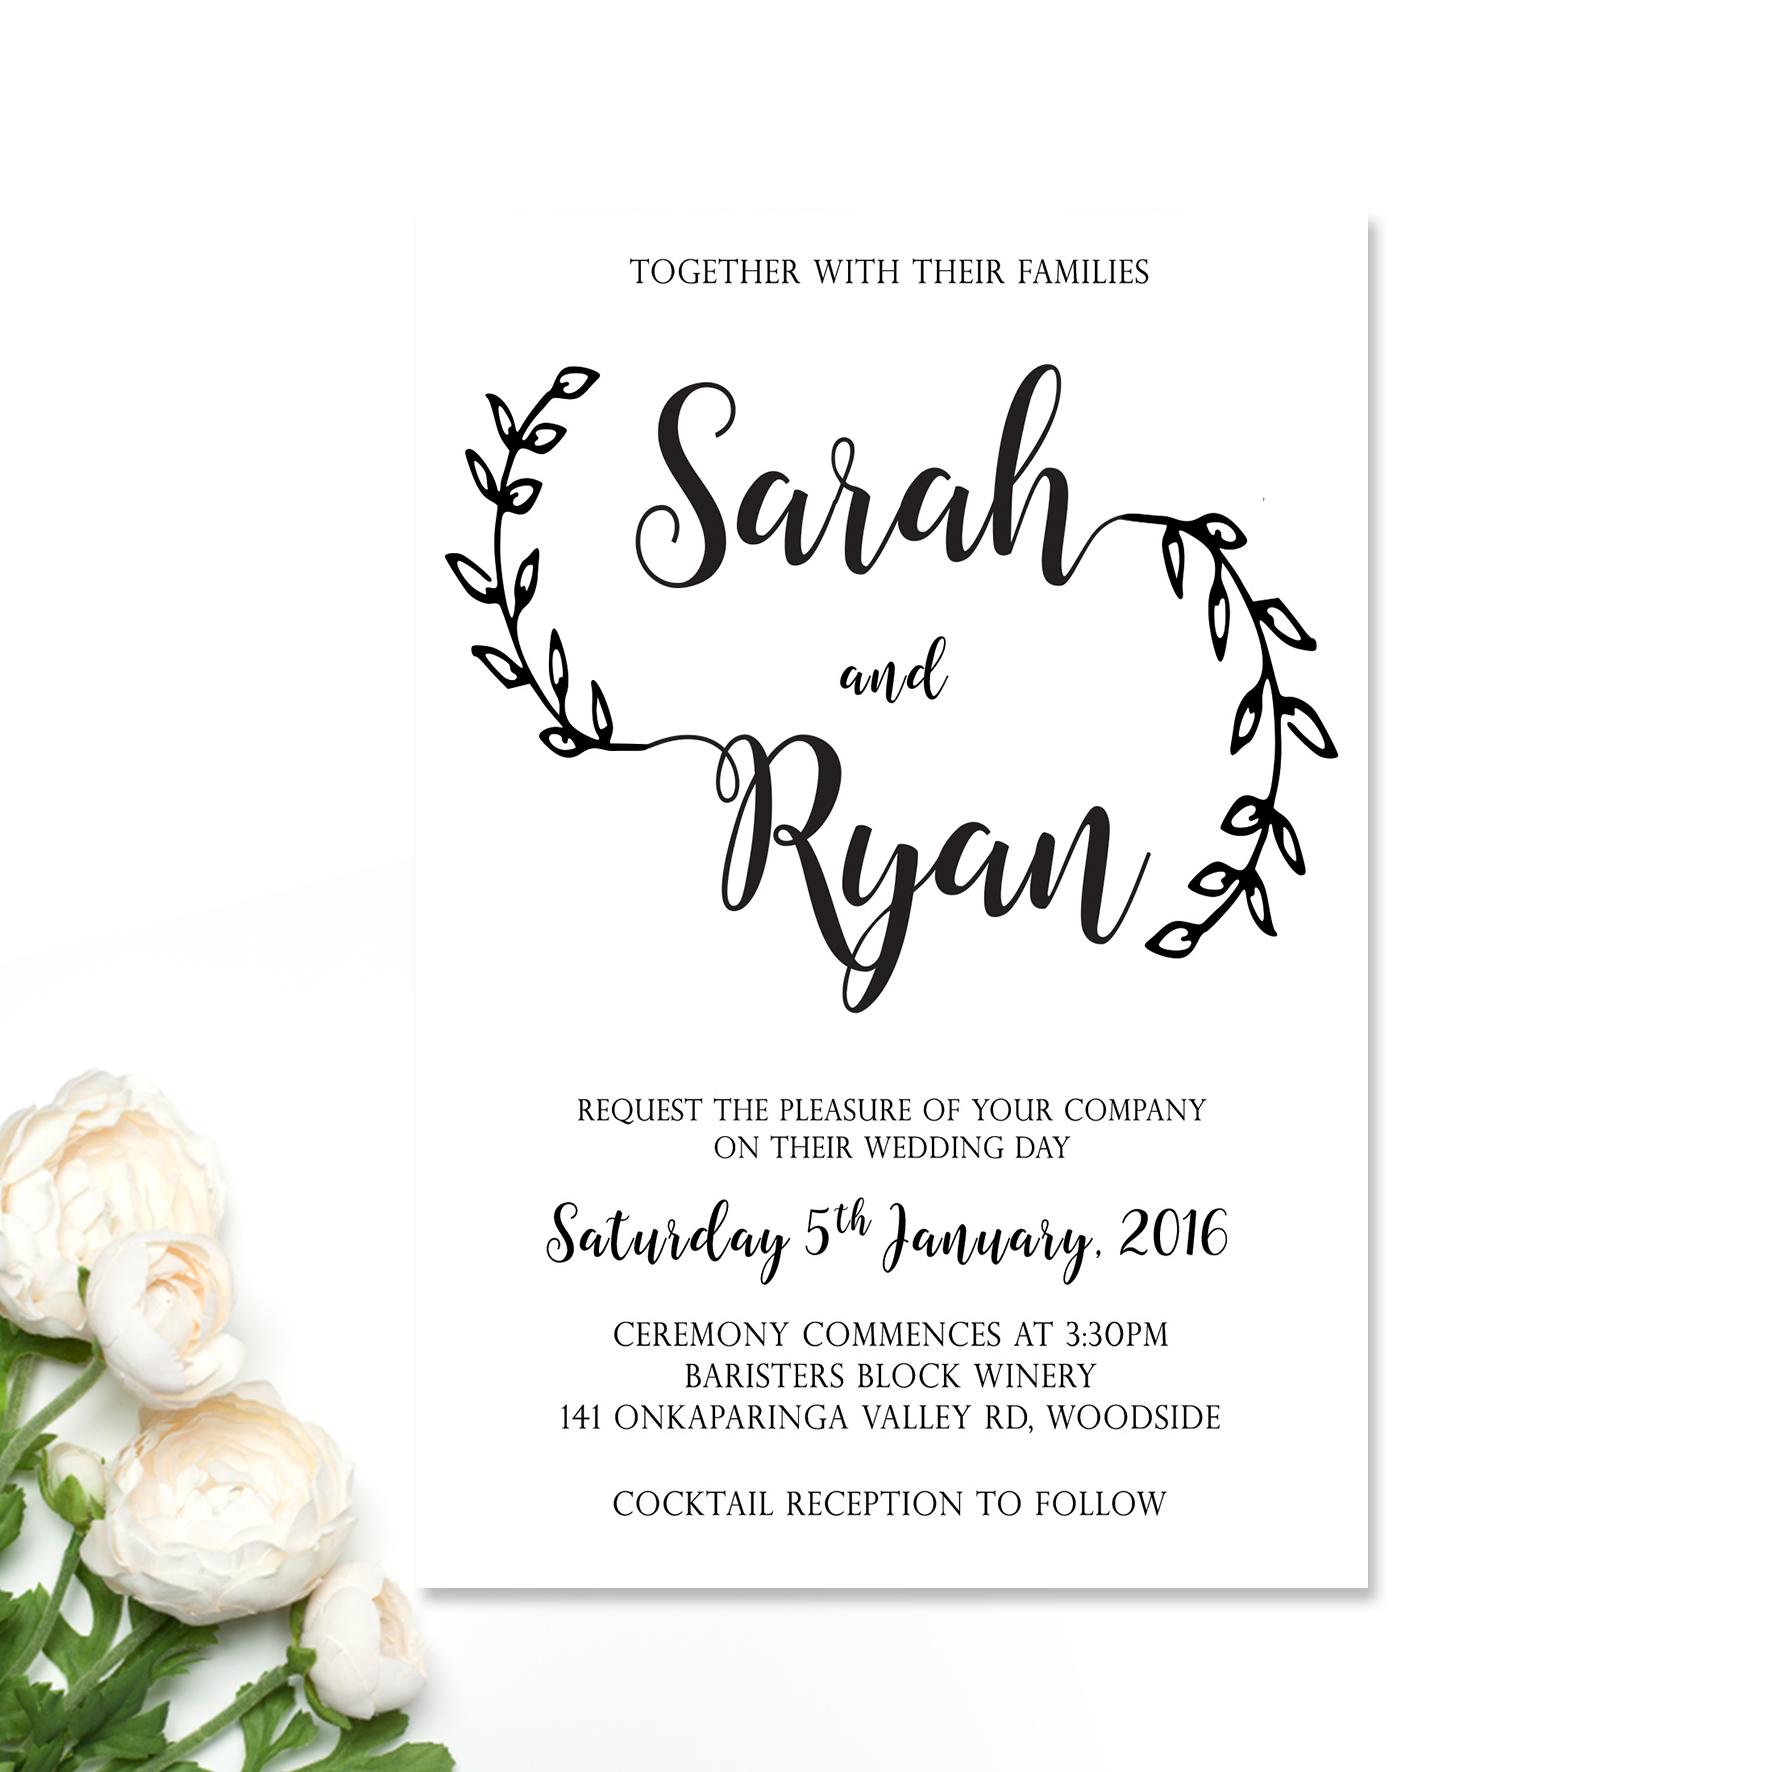 Sarah + Ryan Wedding Invitation